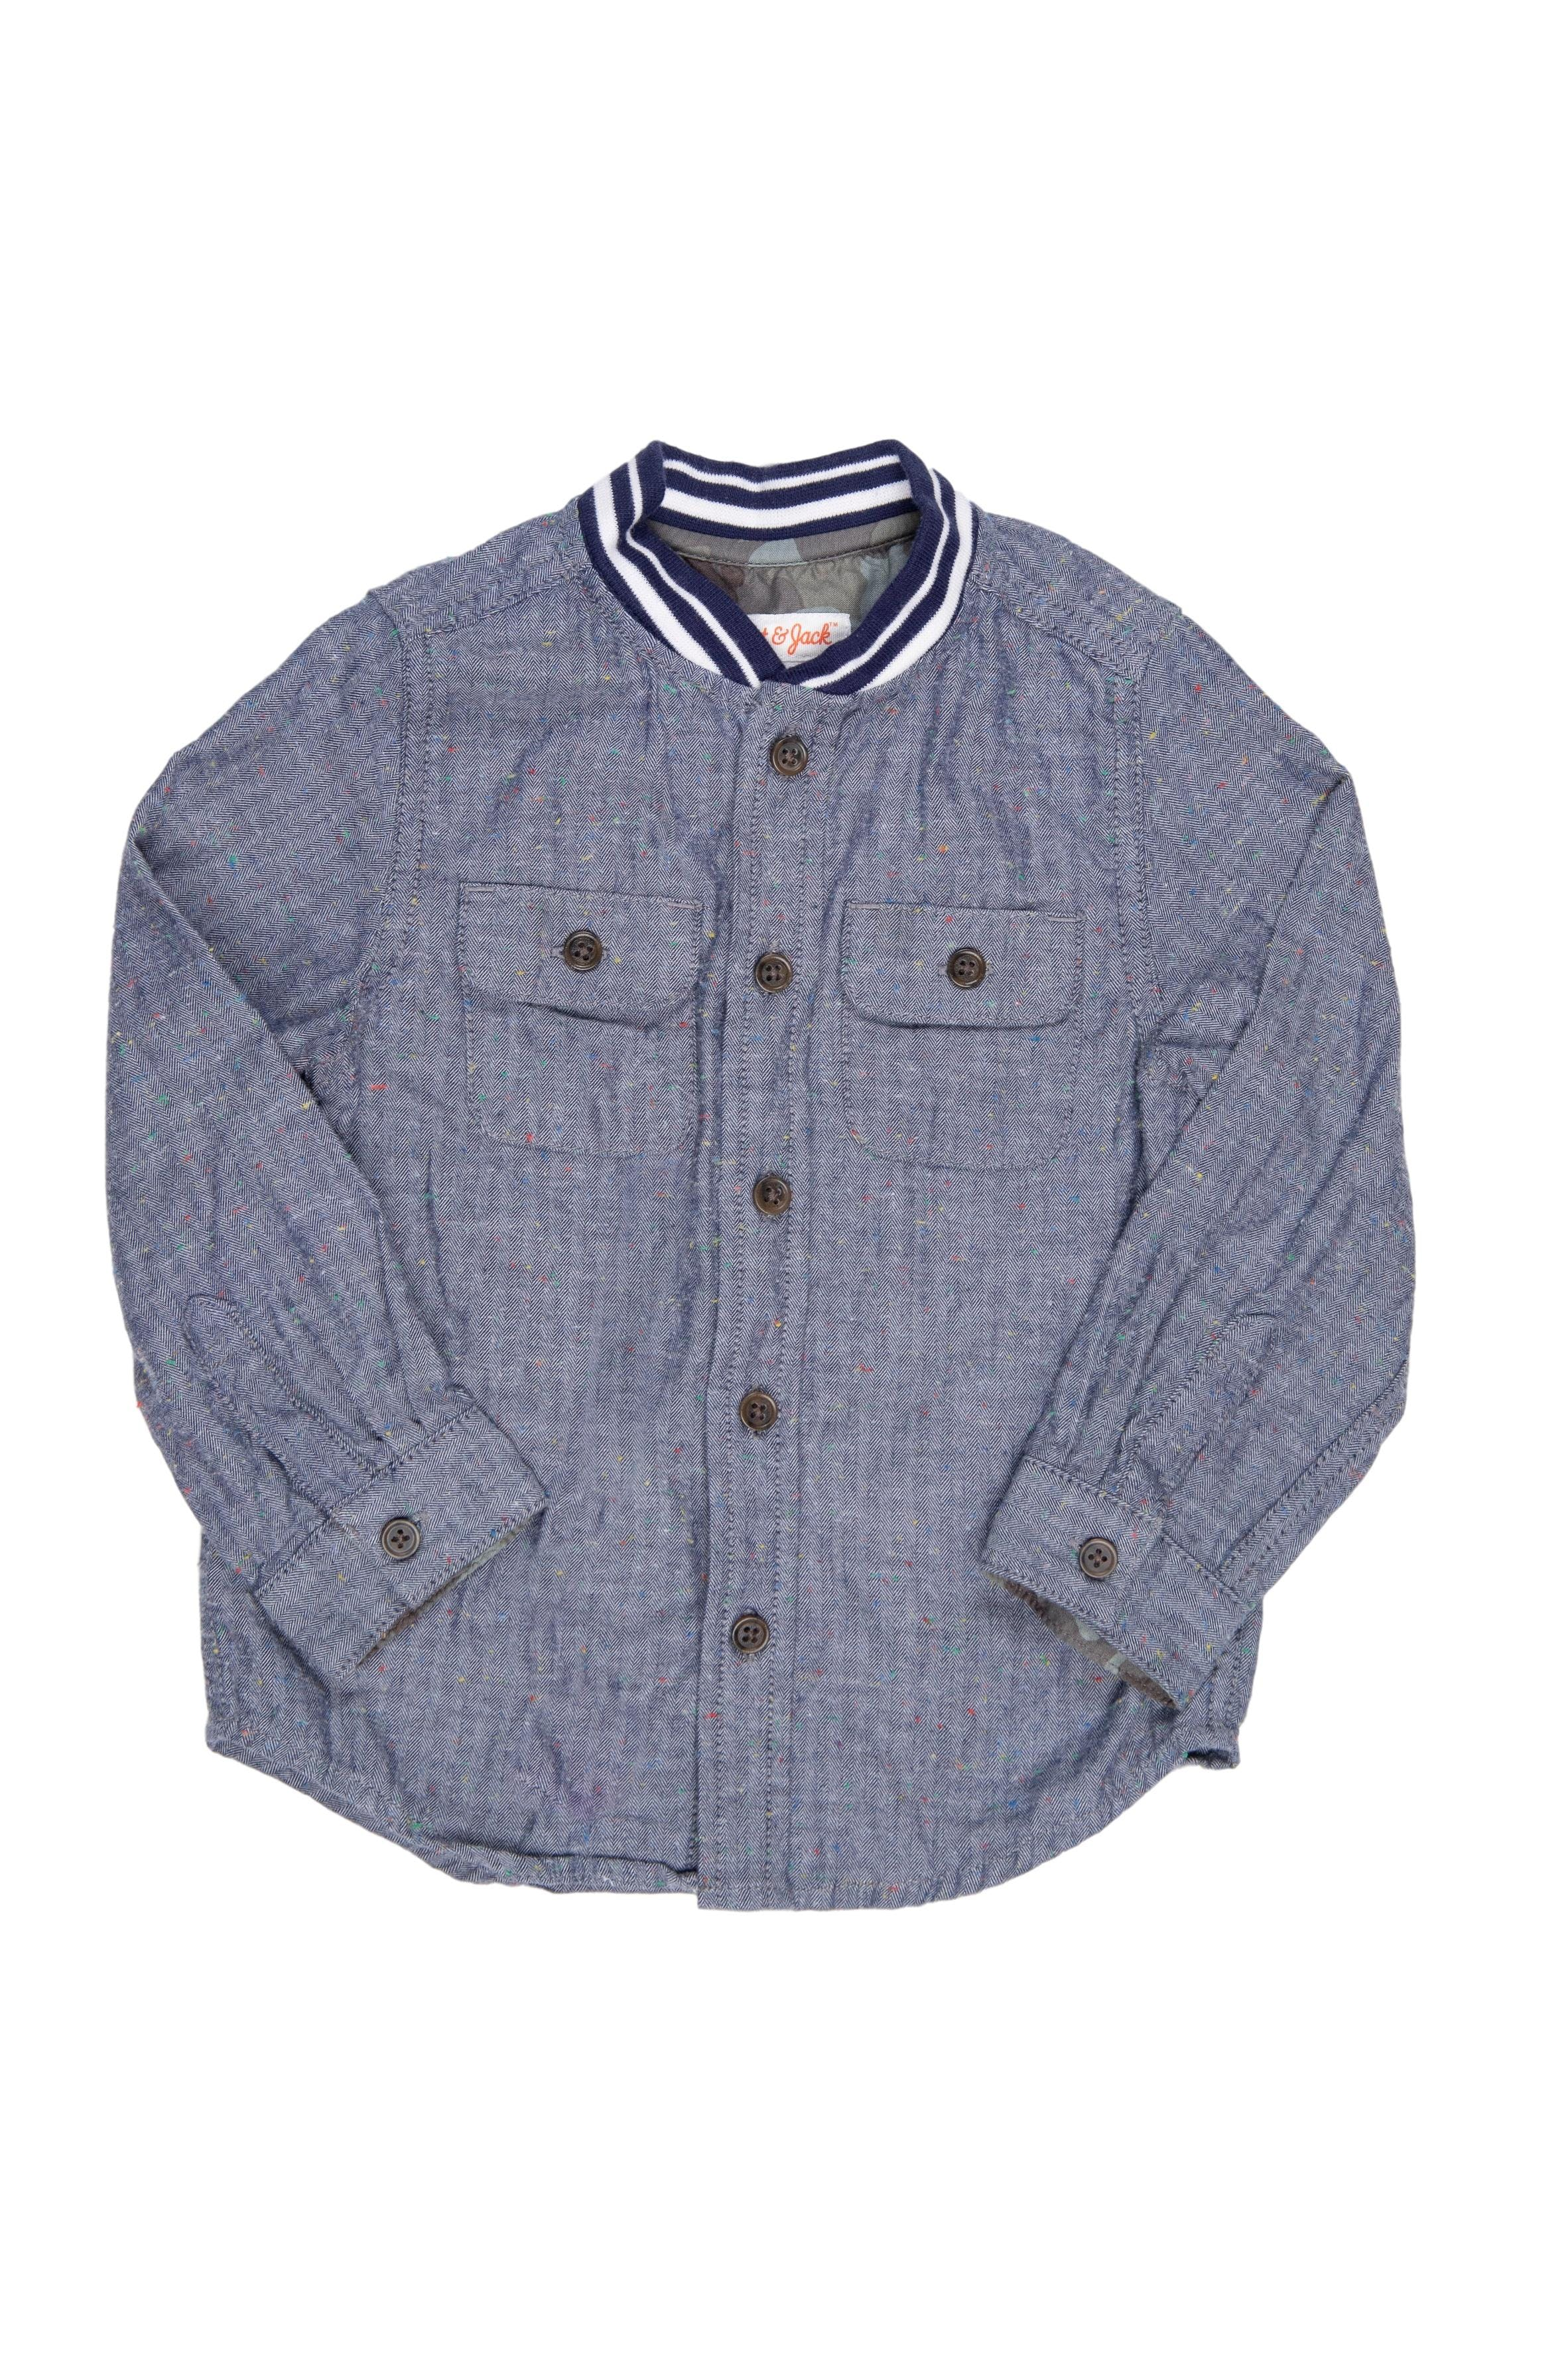 camisa manga larga con cuello rayado, 99% algodón - Cat & Jack